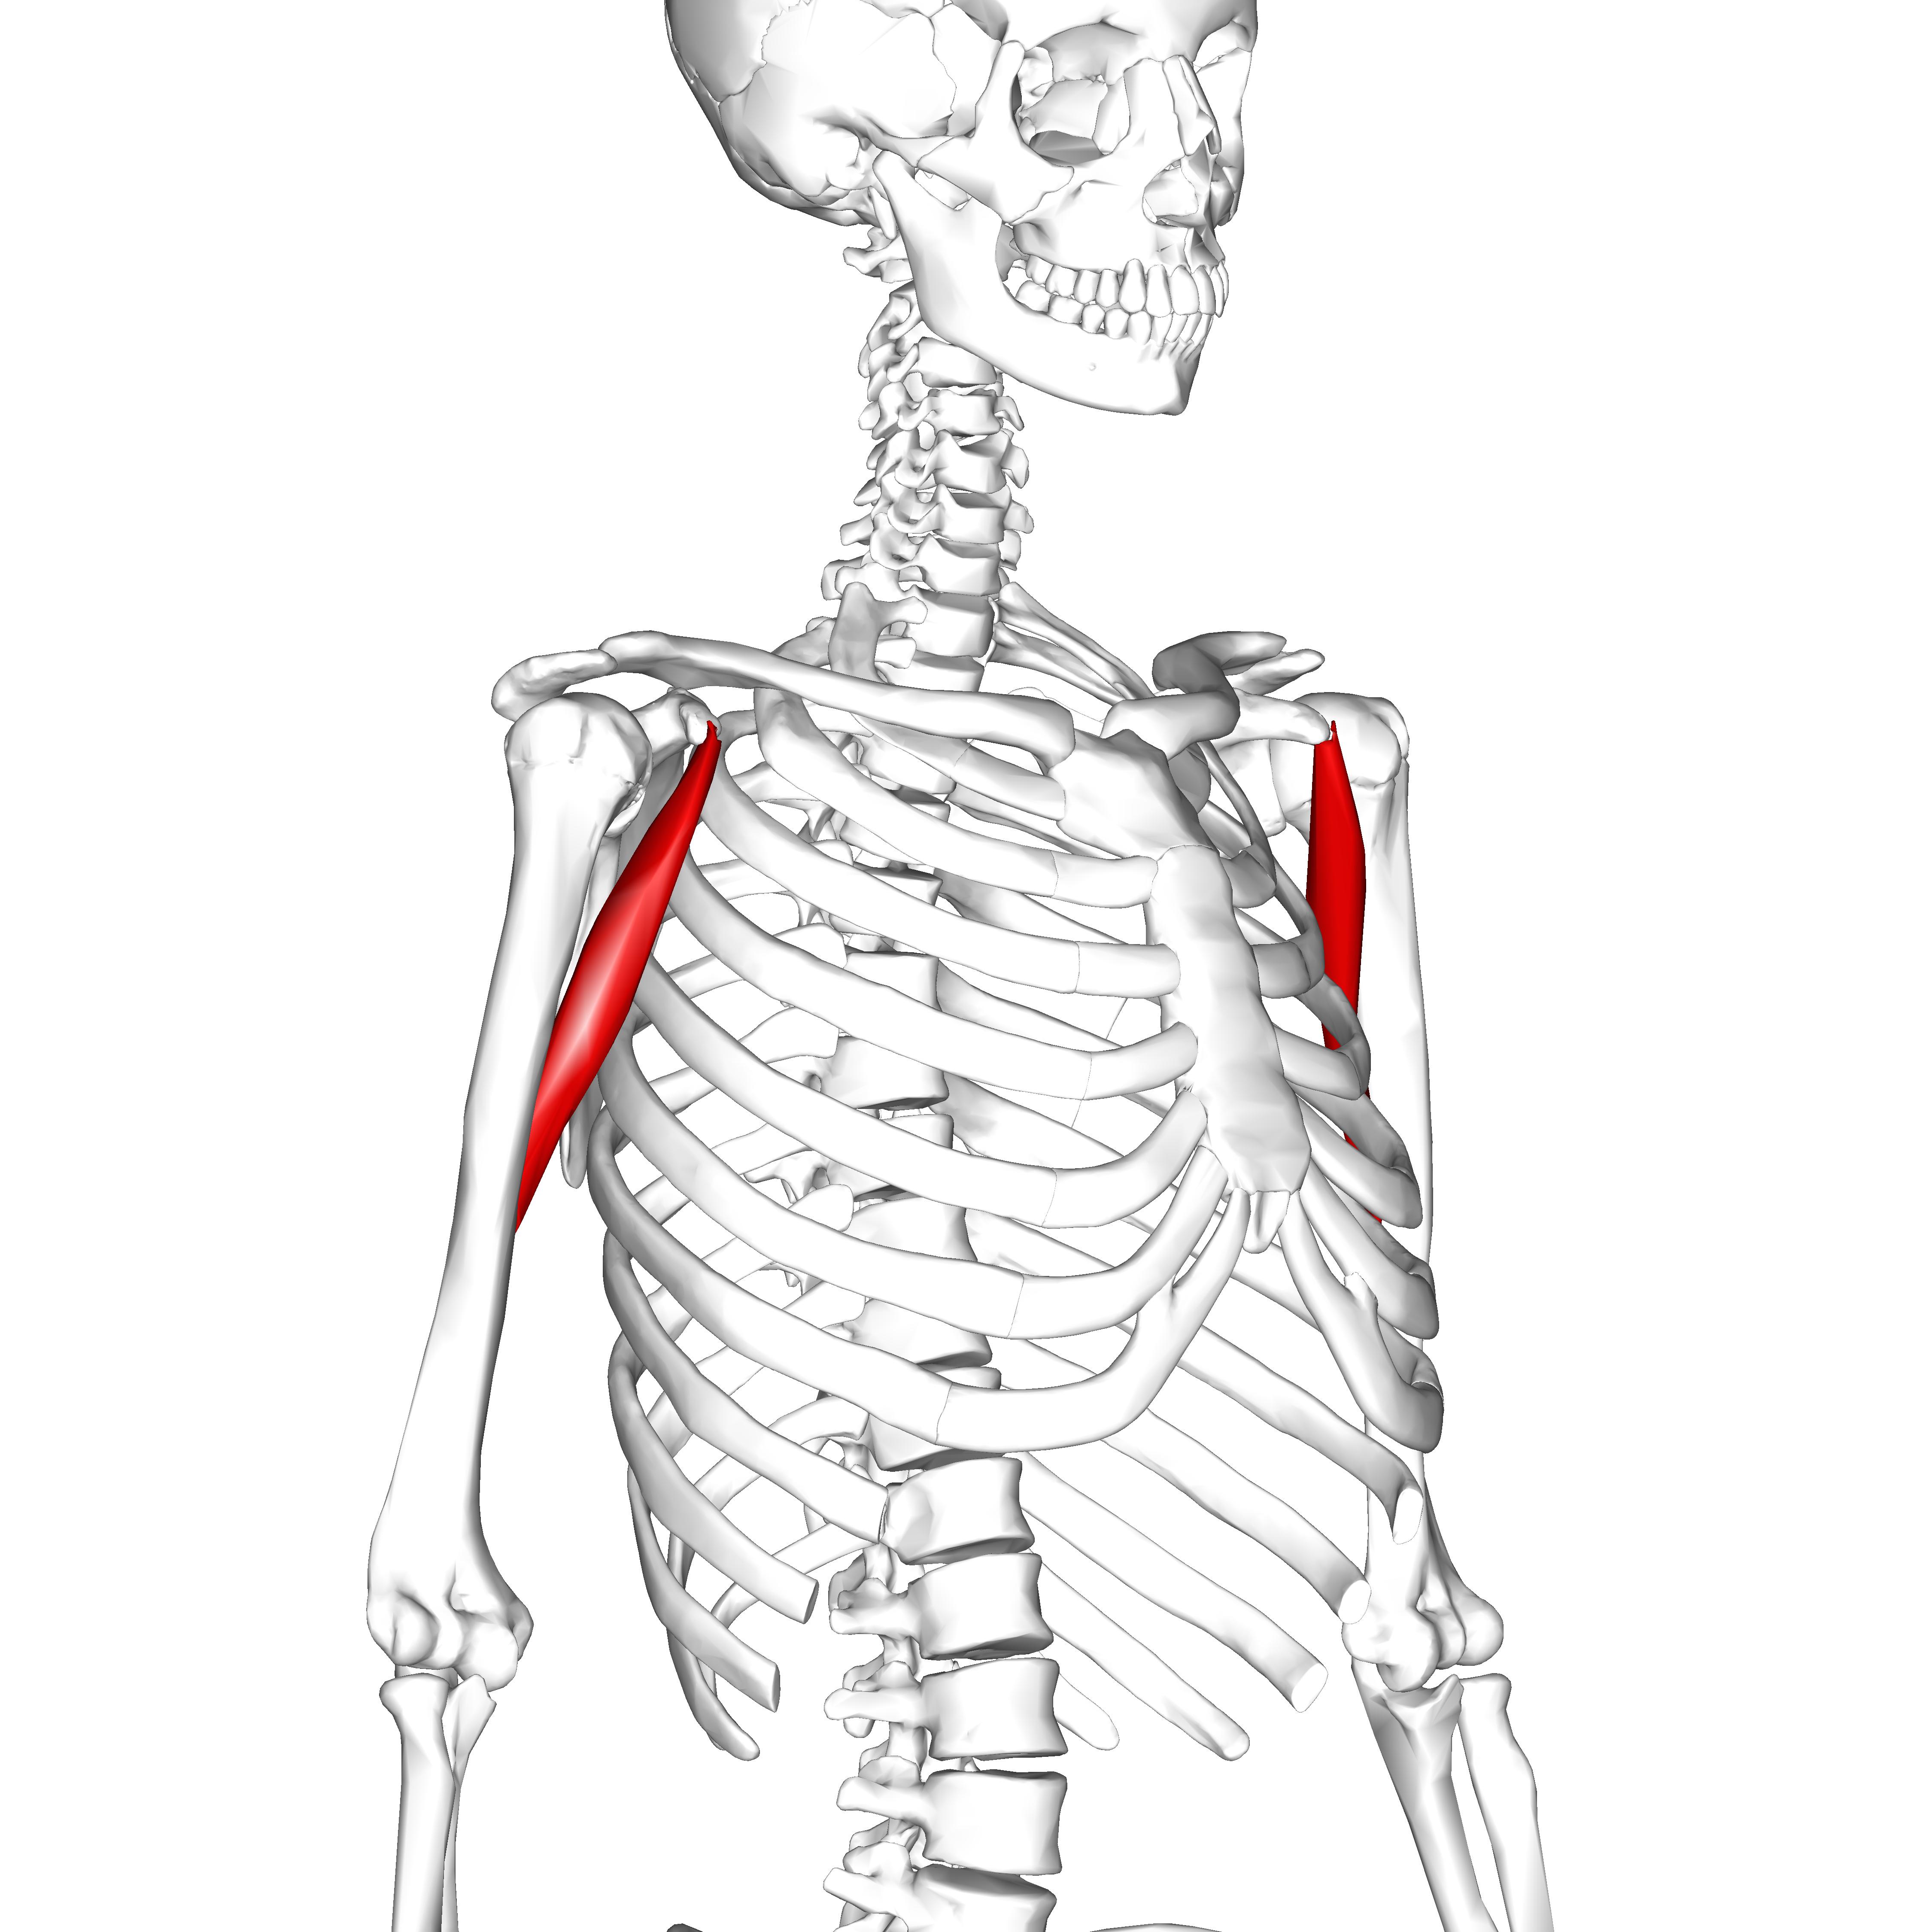 File:Coracobrachialis muscle07.png - Wikimedia Commons